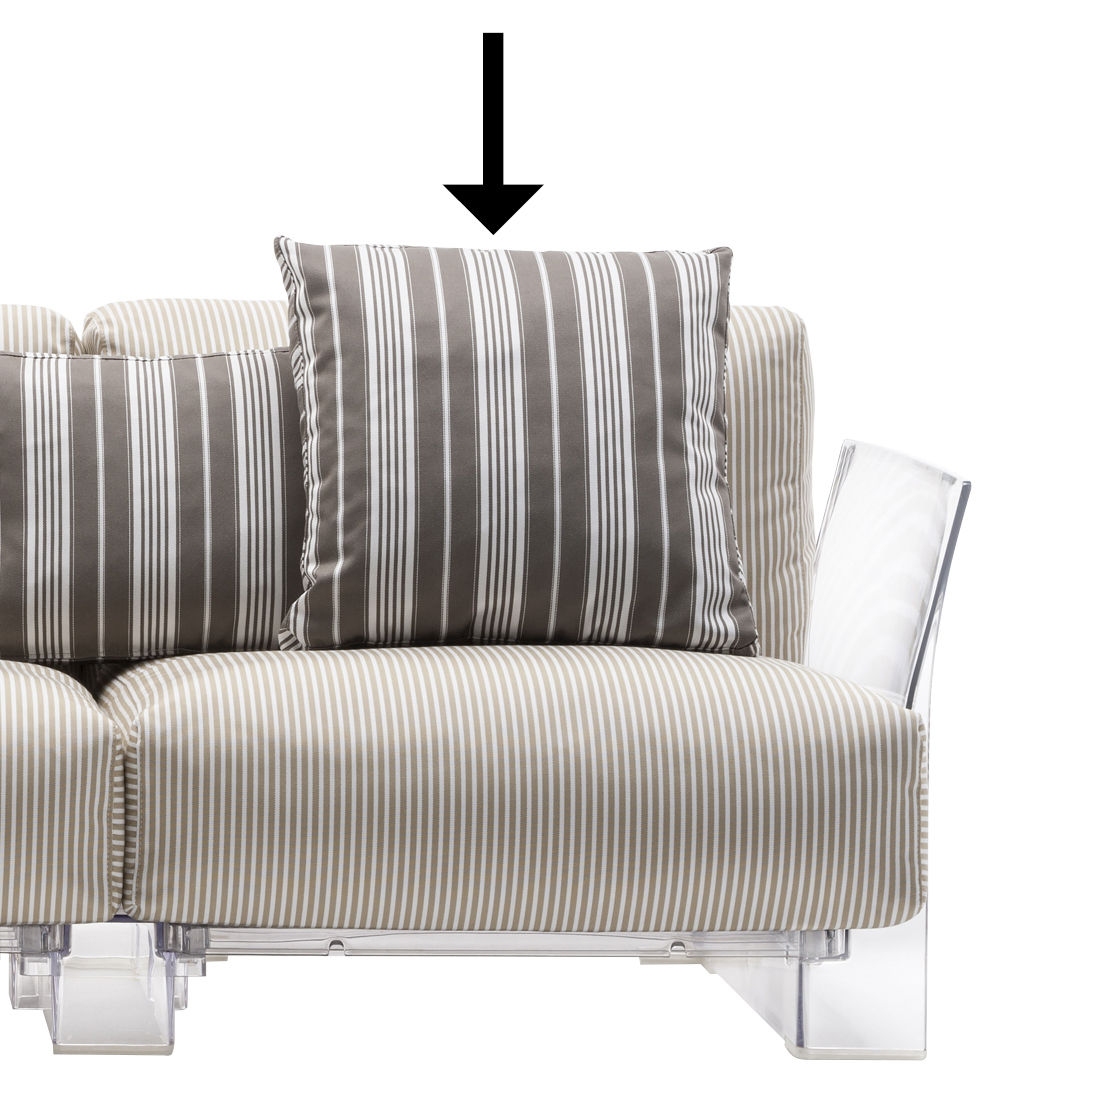 Furniture - Sofas - Sofa accessory - / 48 x 48 cm by Kartell - 48 x 48 cm / Dove grey - Acrylic fabric, Expanded polyurethane